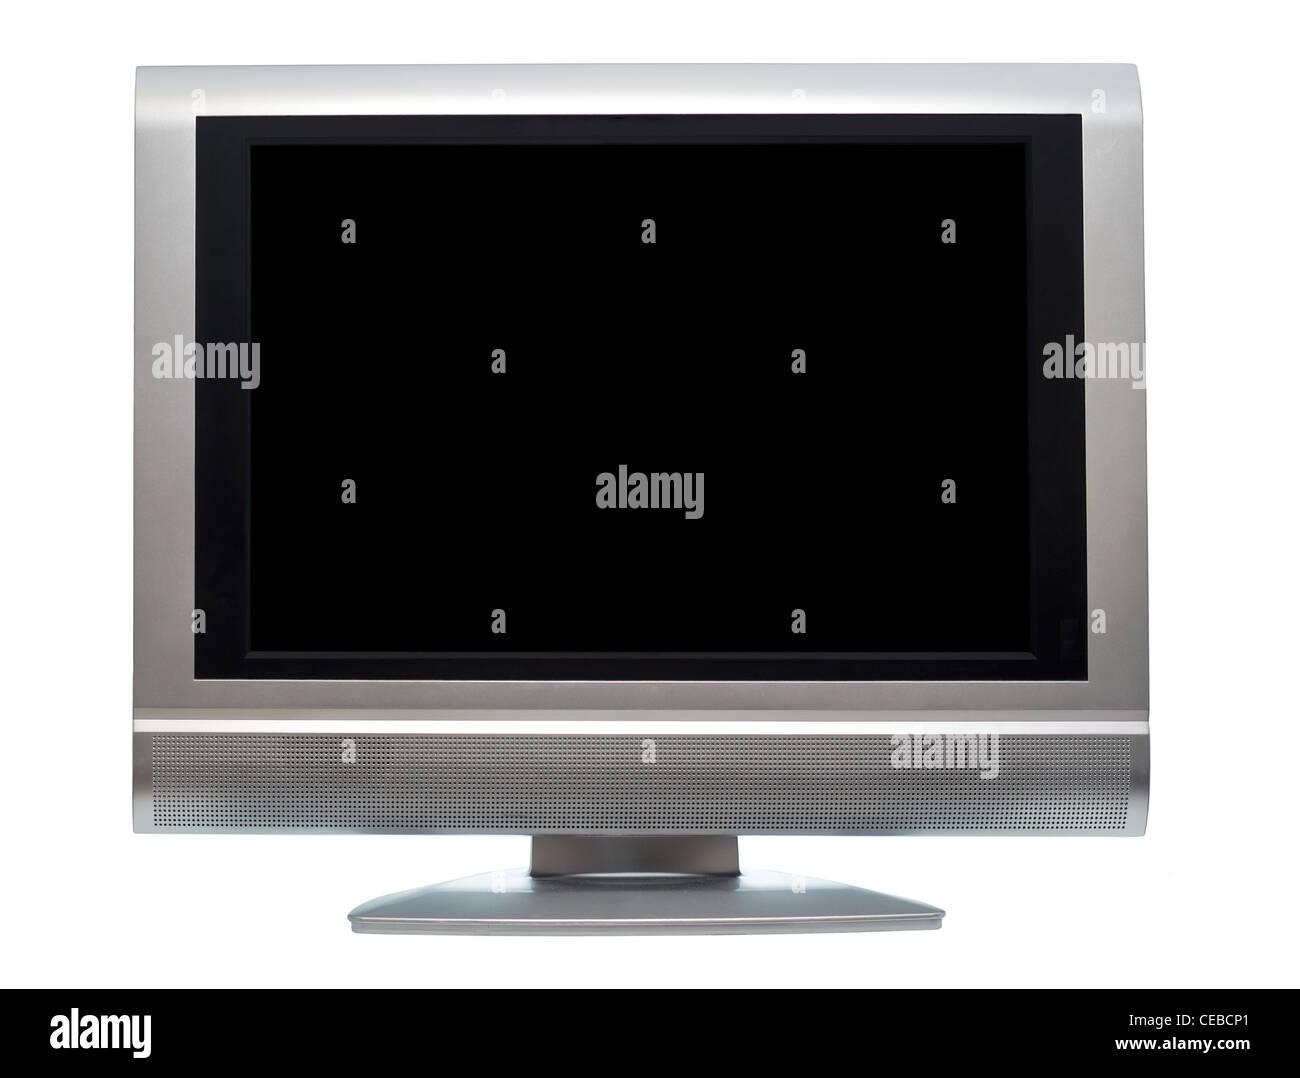 Flat Screen LCD Television Set - Stock Image